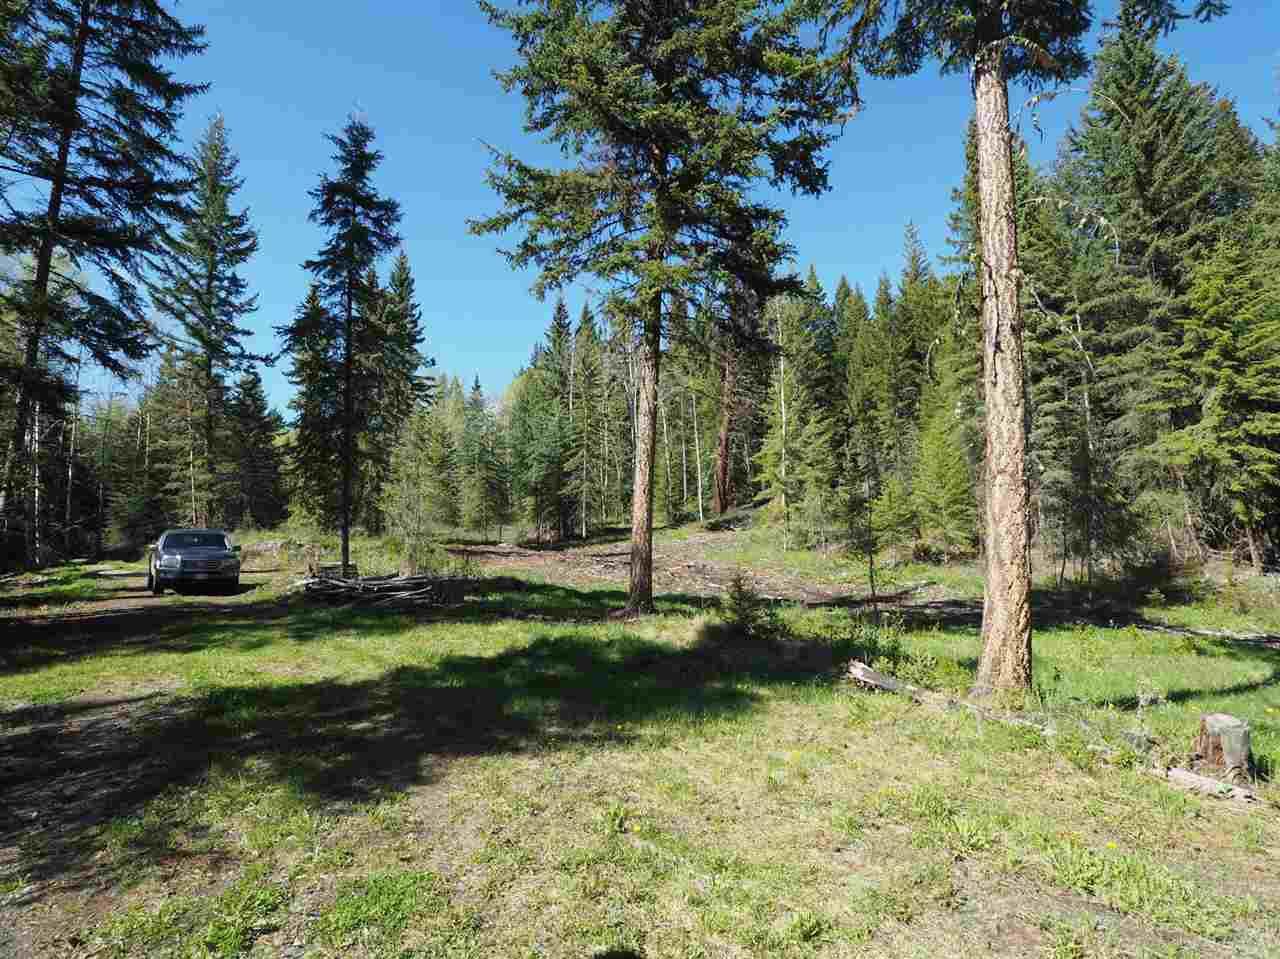 Photo 26: Photos: 8222 CENTENNIAL Road in Bridge Lake: Bridge Lake/Sheridan Lake House for sale (100 Mile House (Zone 10))  : MLS®# R2457362